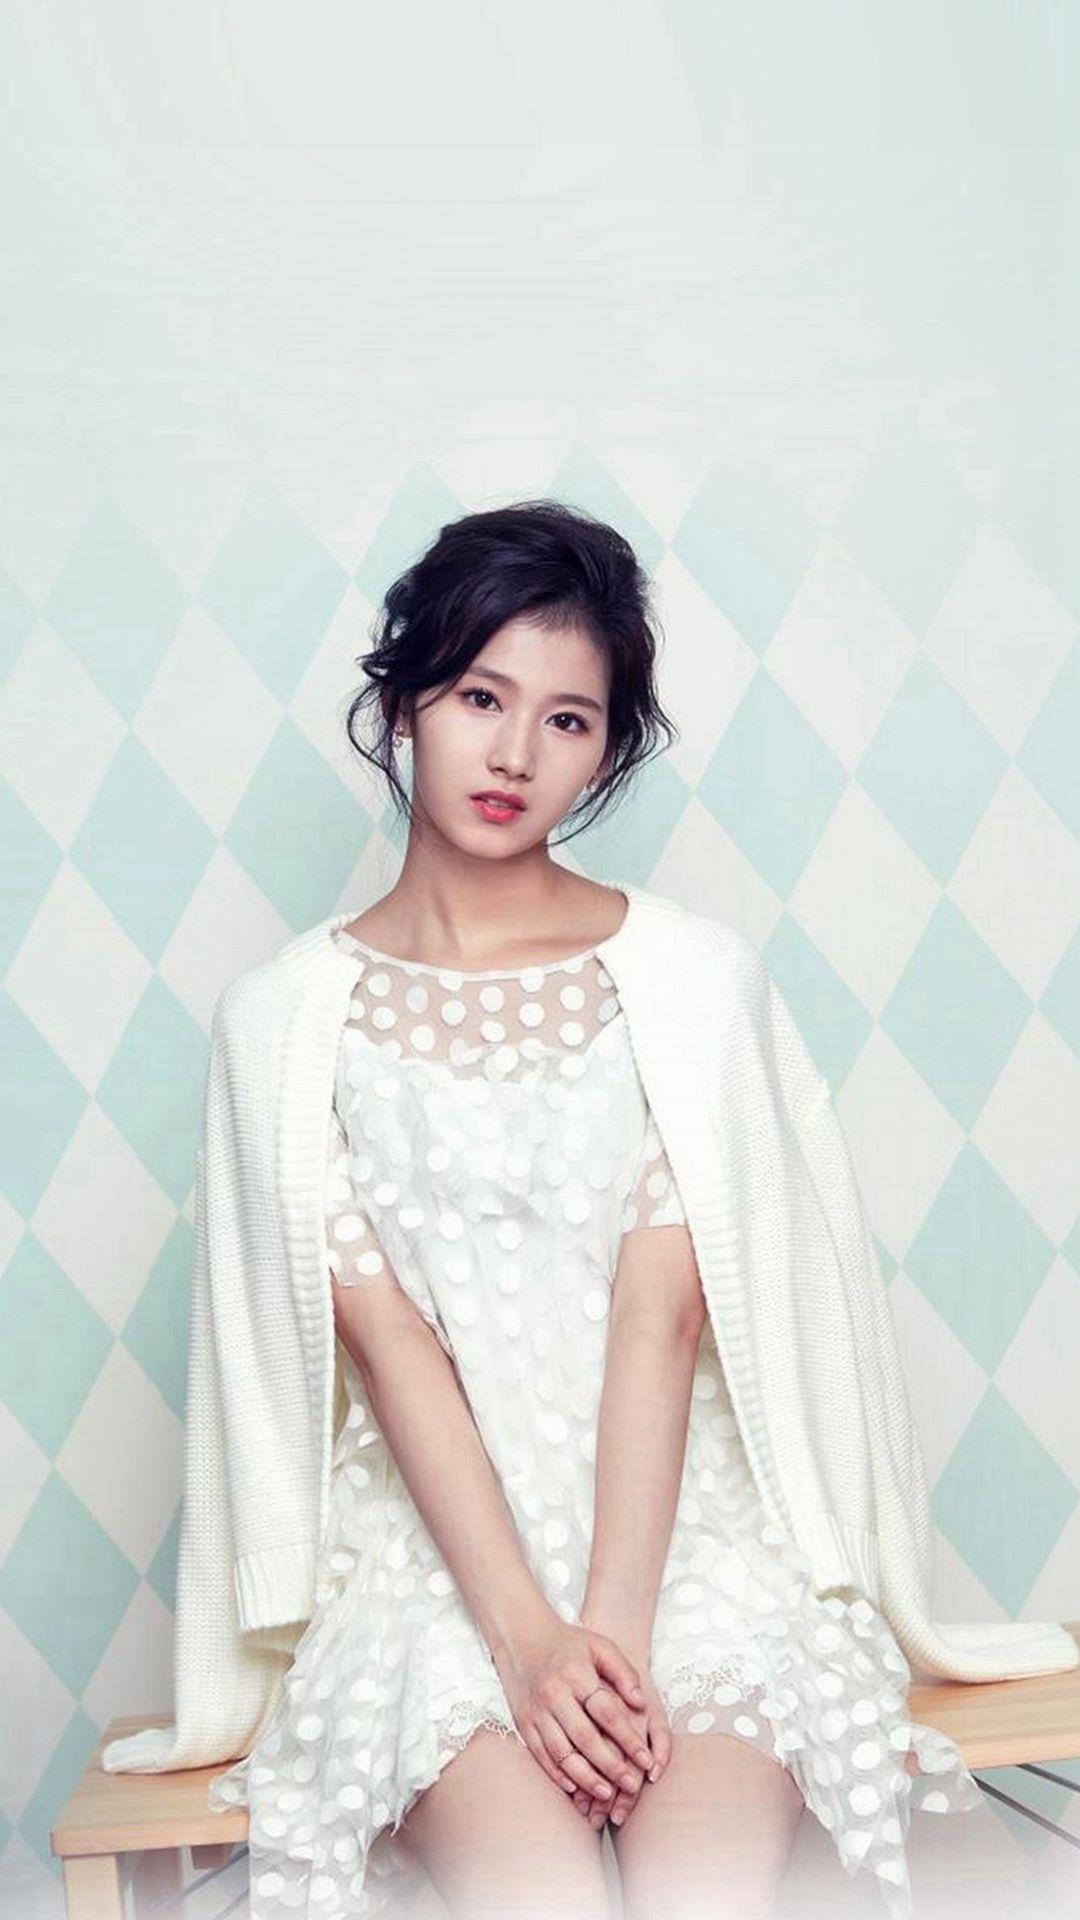 Sana Girl Kpop Twice Iphone 8 Wallpapers Kpop Girls Girl Twice